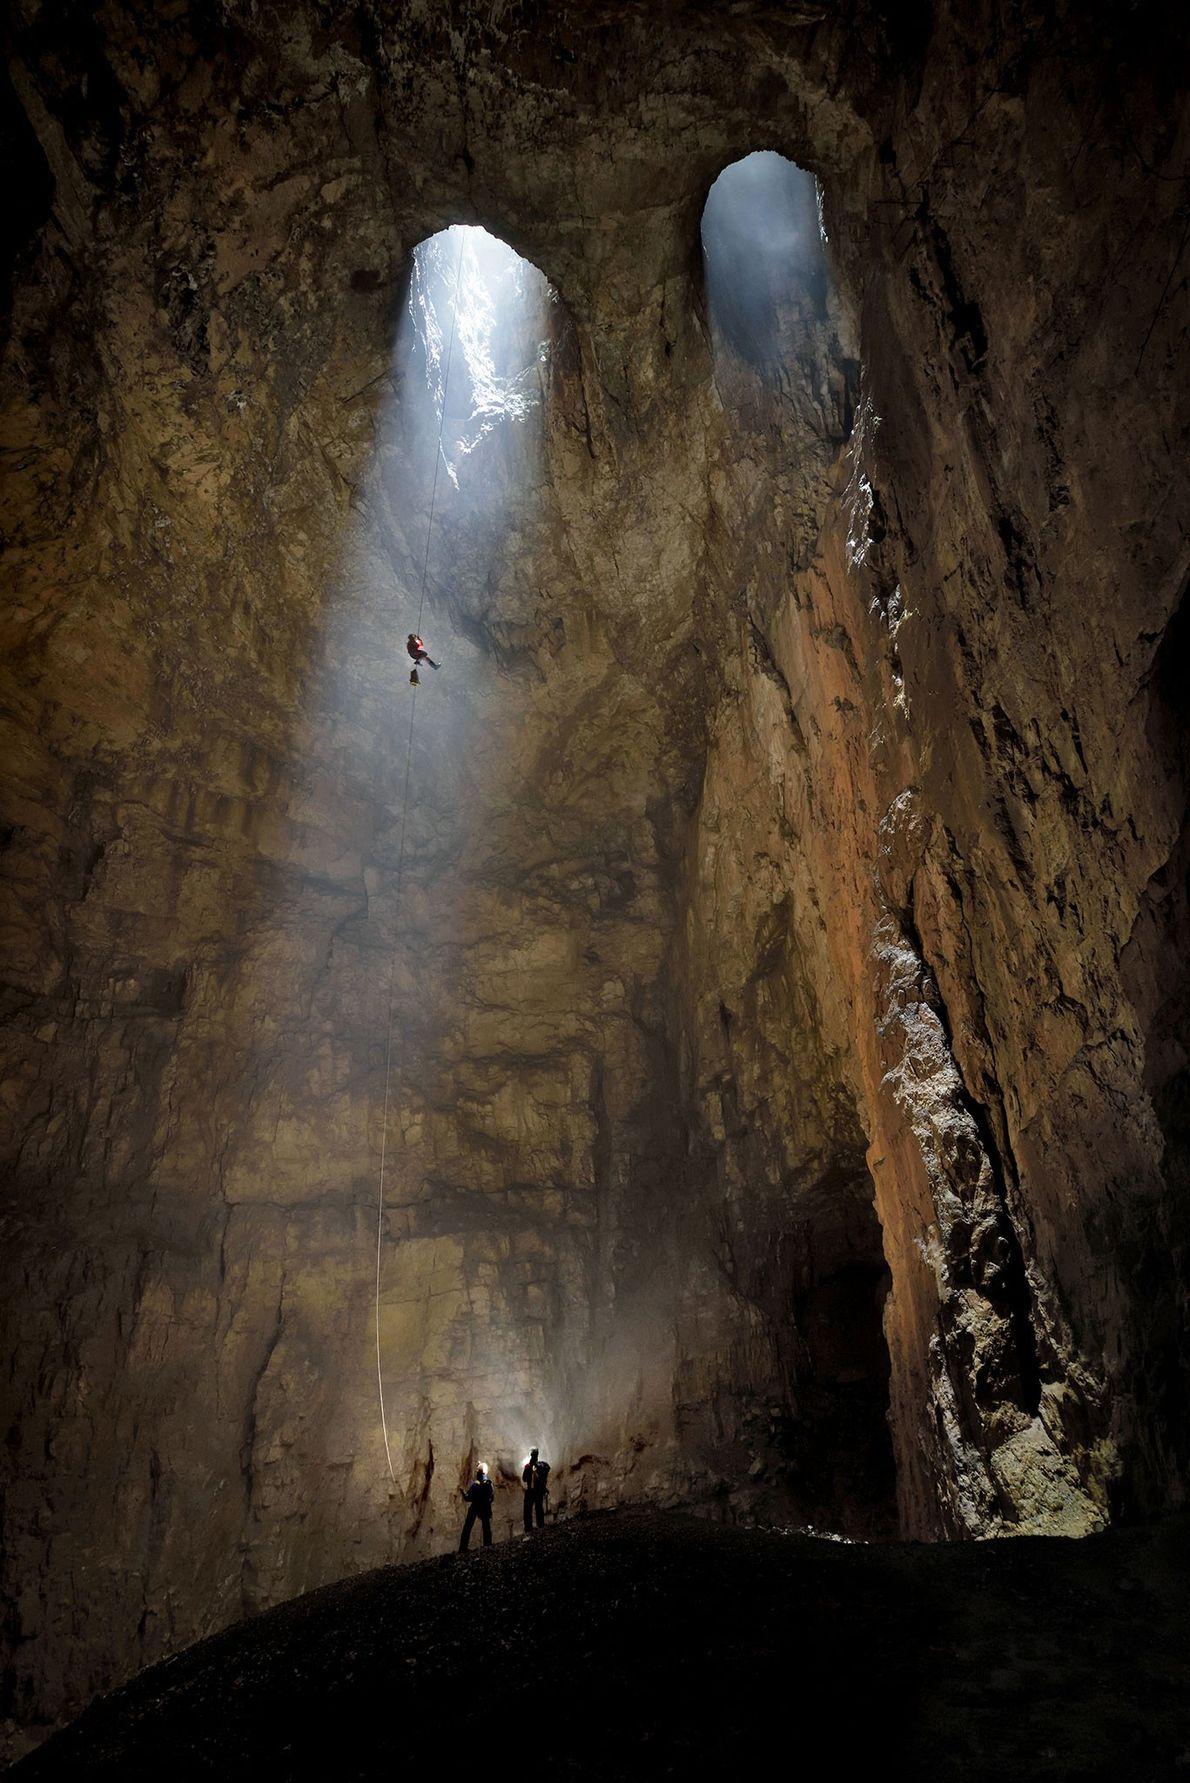 Os icónicos portais de claraboias gémeas da caverna Kačna jama, na Eslovénia.